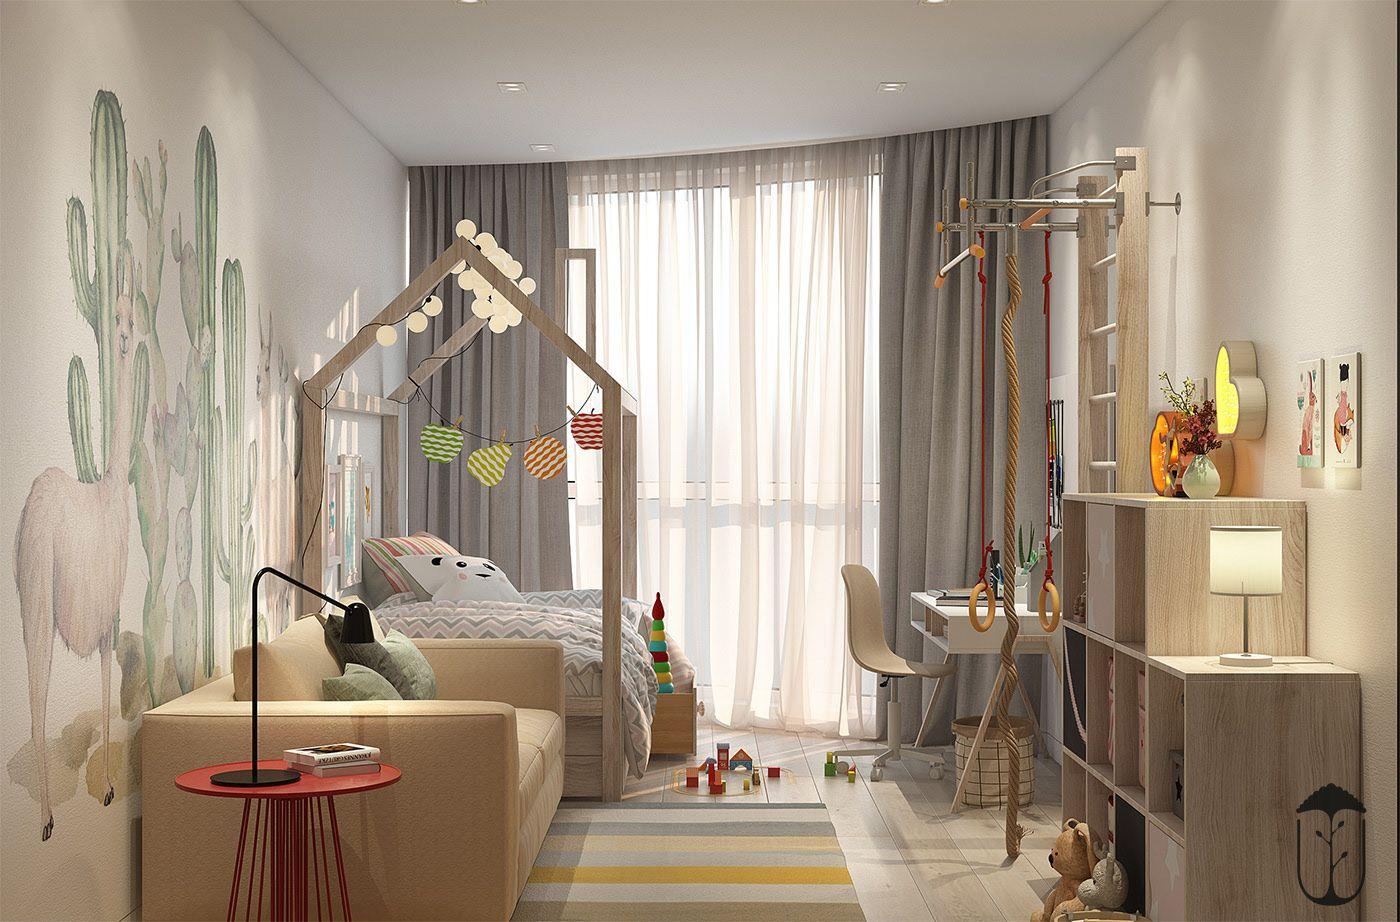 Ui038 On Behance Living Room Design Modern Bedroom Wall Designs Interior Design